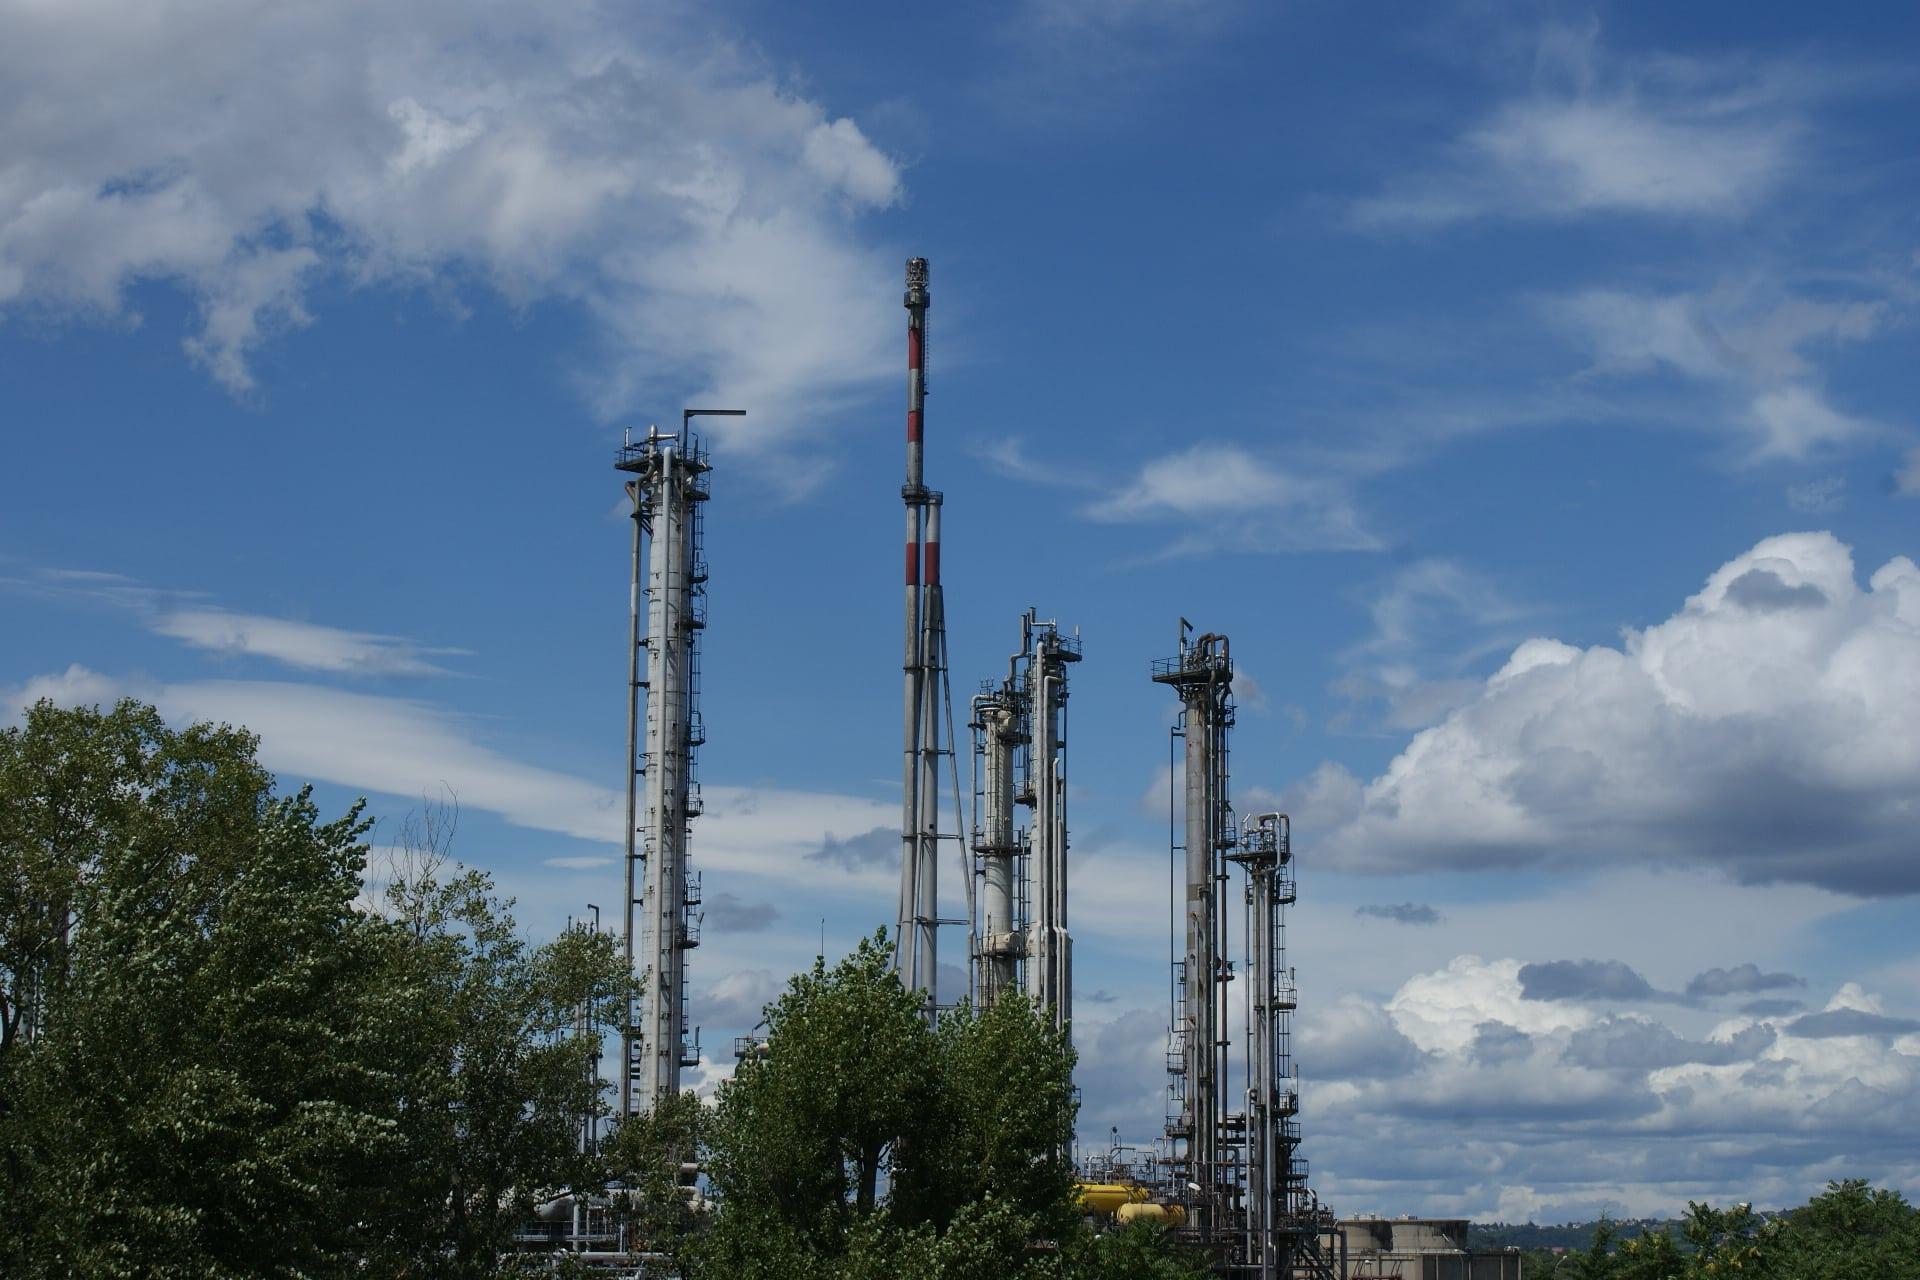 La torche nord de la raffinerie Total de Feyzin /©MP Rue89lyon